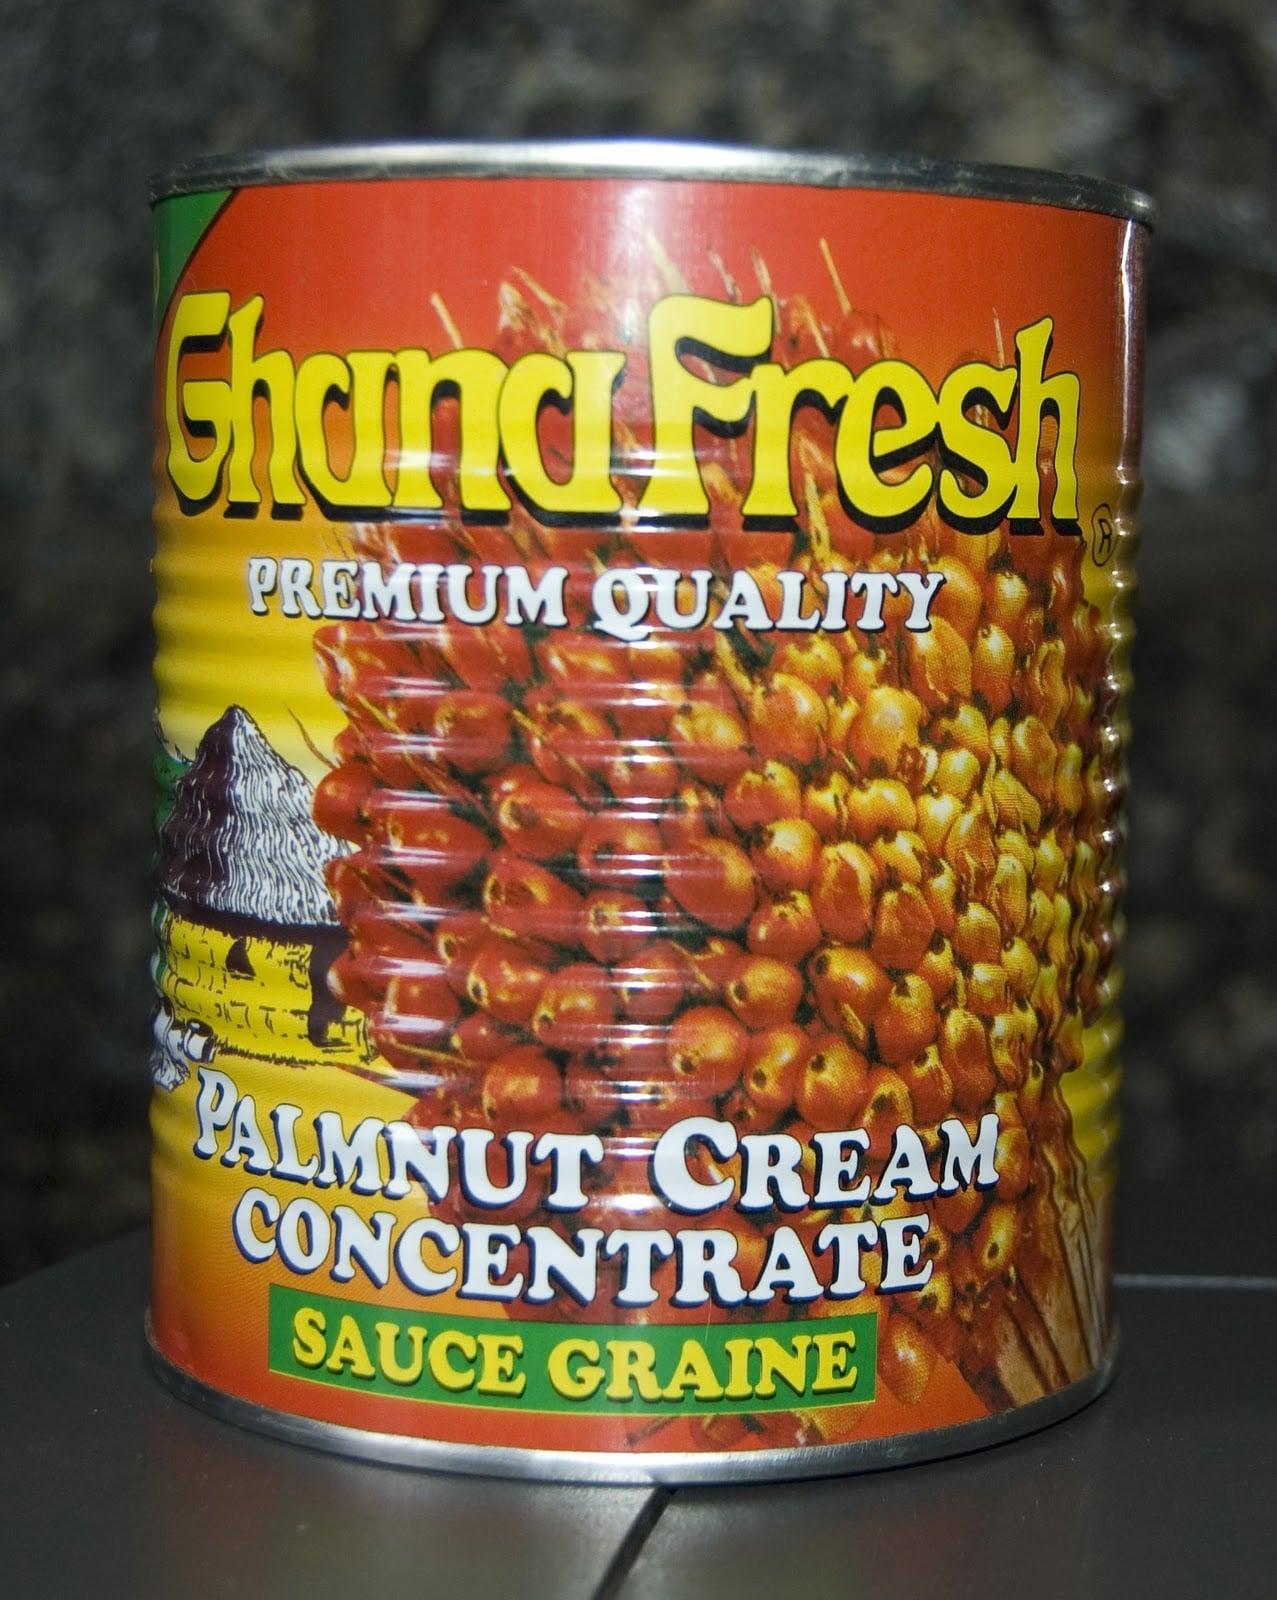 Ghana Fresh Palmnut Creme sauce for moambe